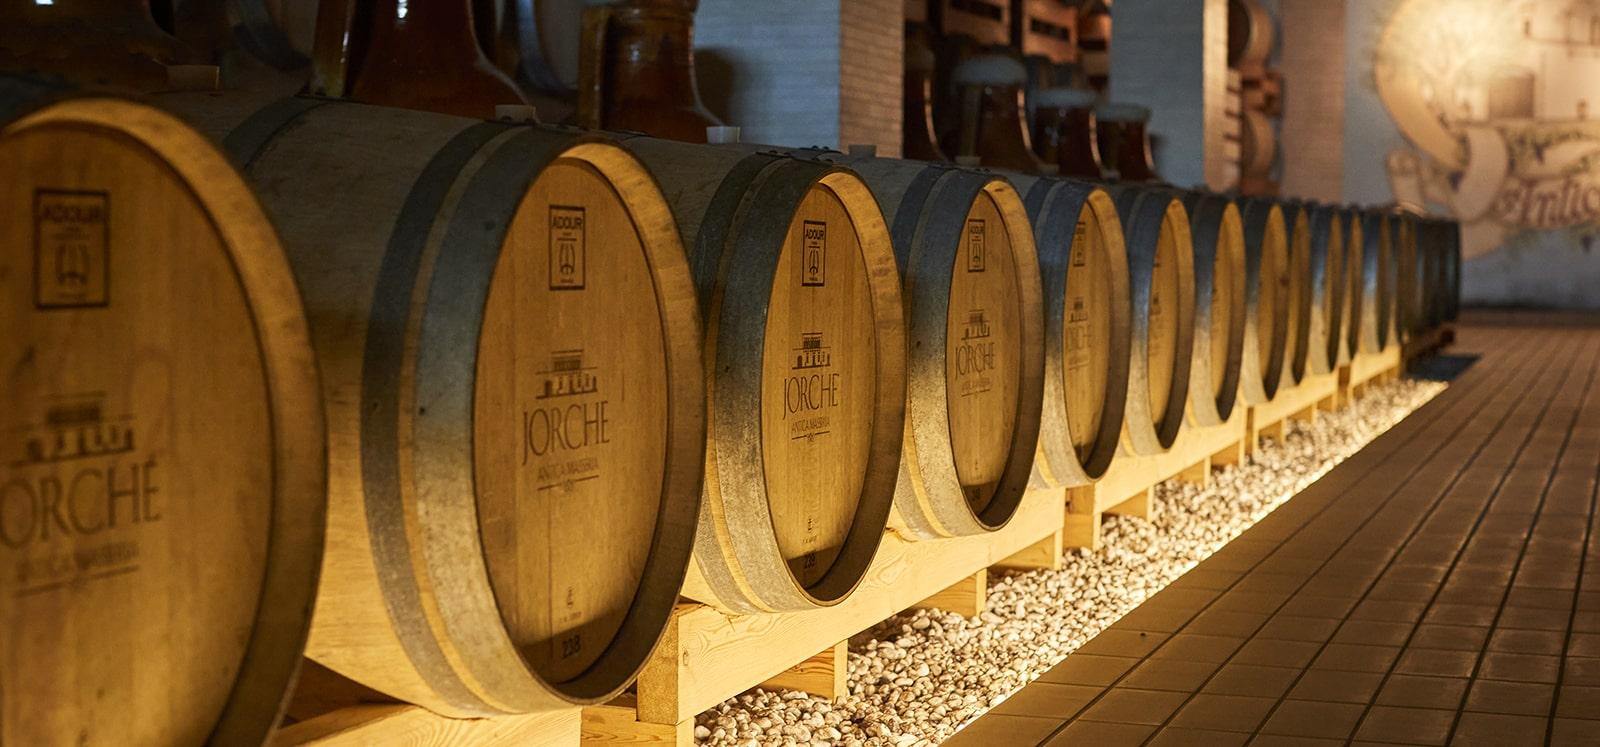 Masseria Jorche Azienda vinicola